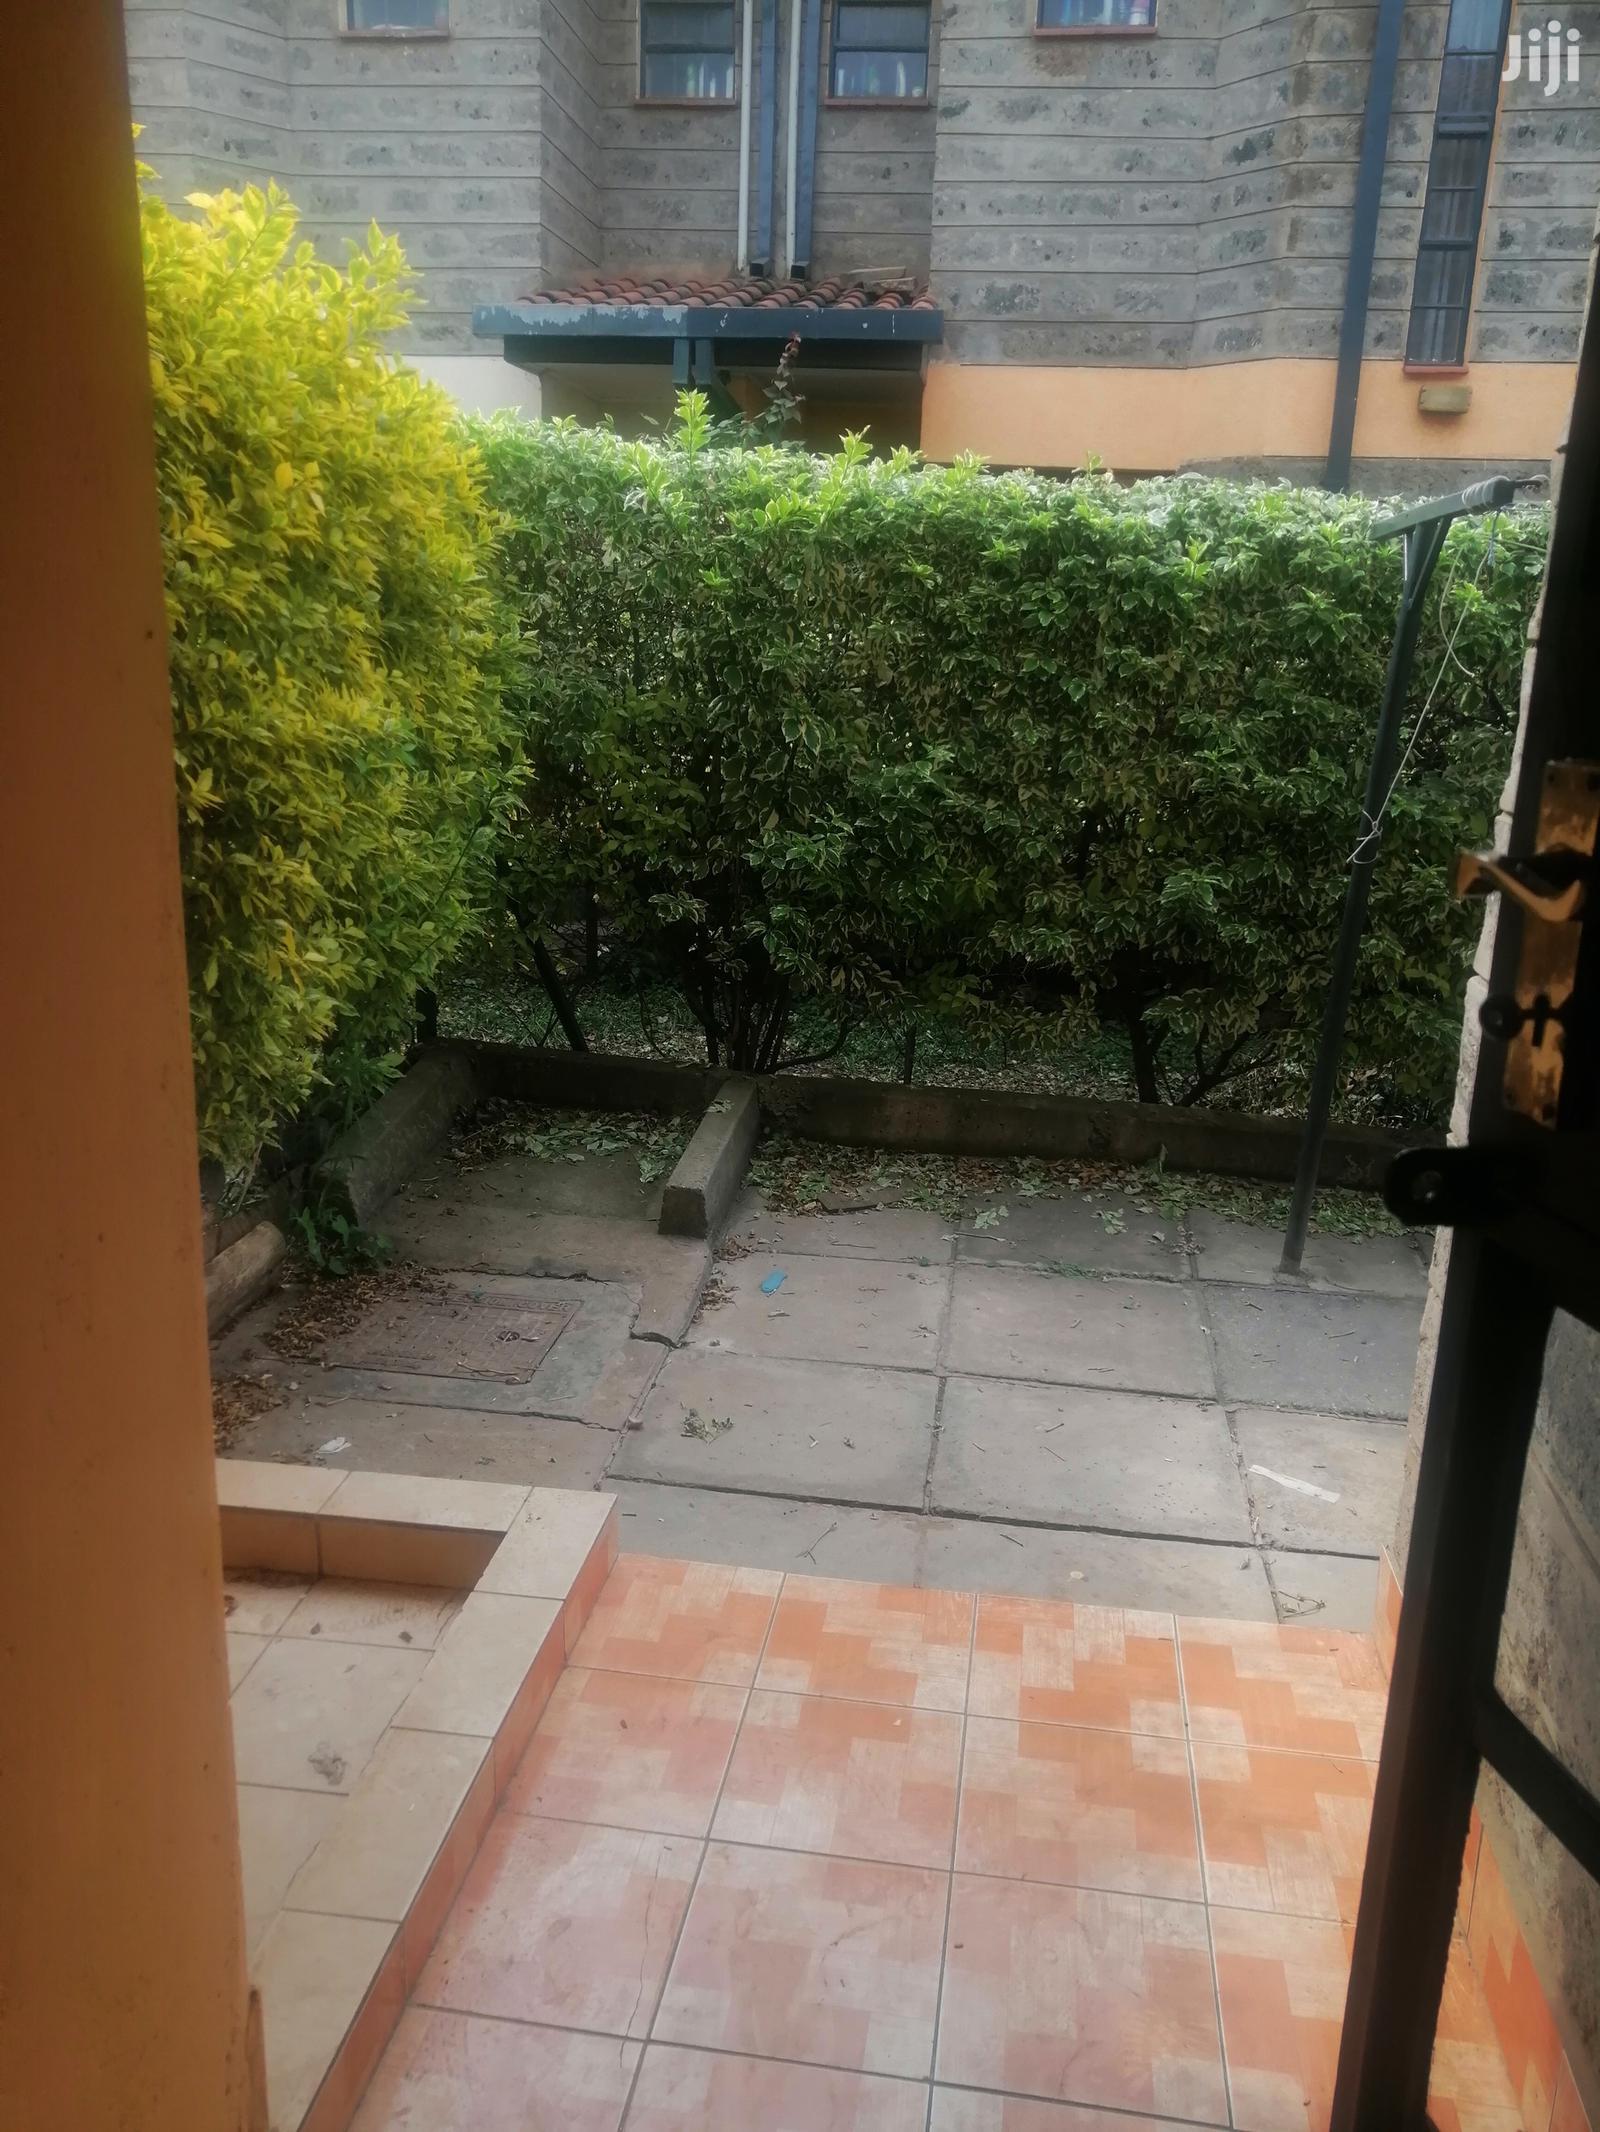 3 Bedroom Plus SQ Villa for Rent | Houses & Apartments For Rent for sale in Ongata Rongai, Kajiado, Kenya